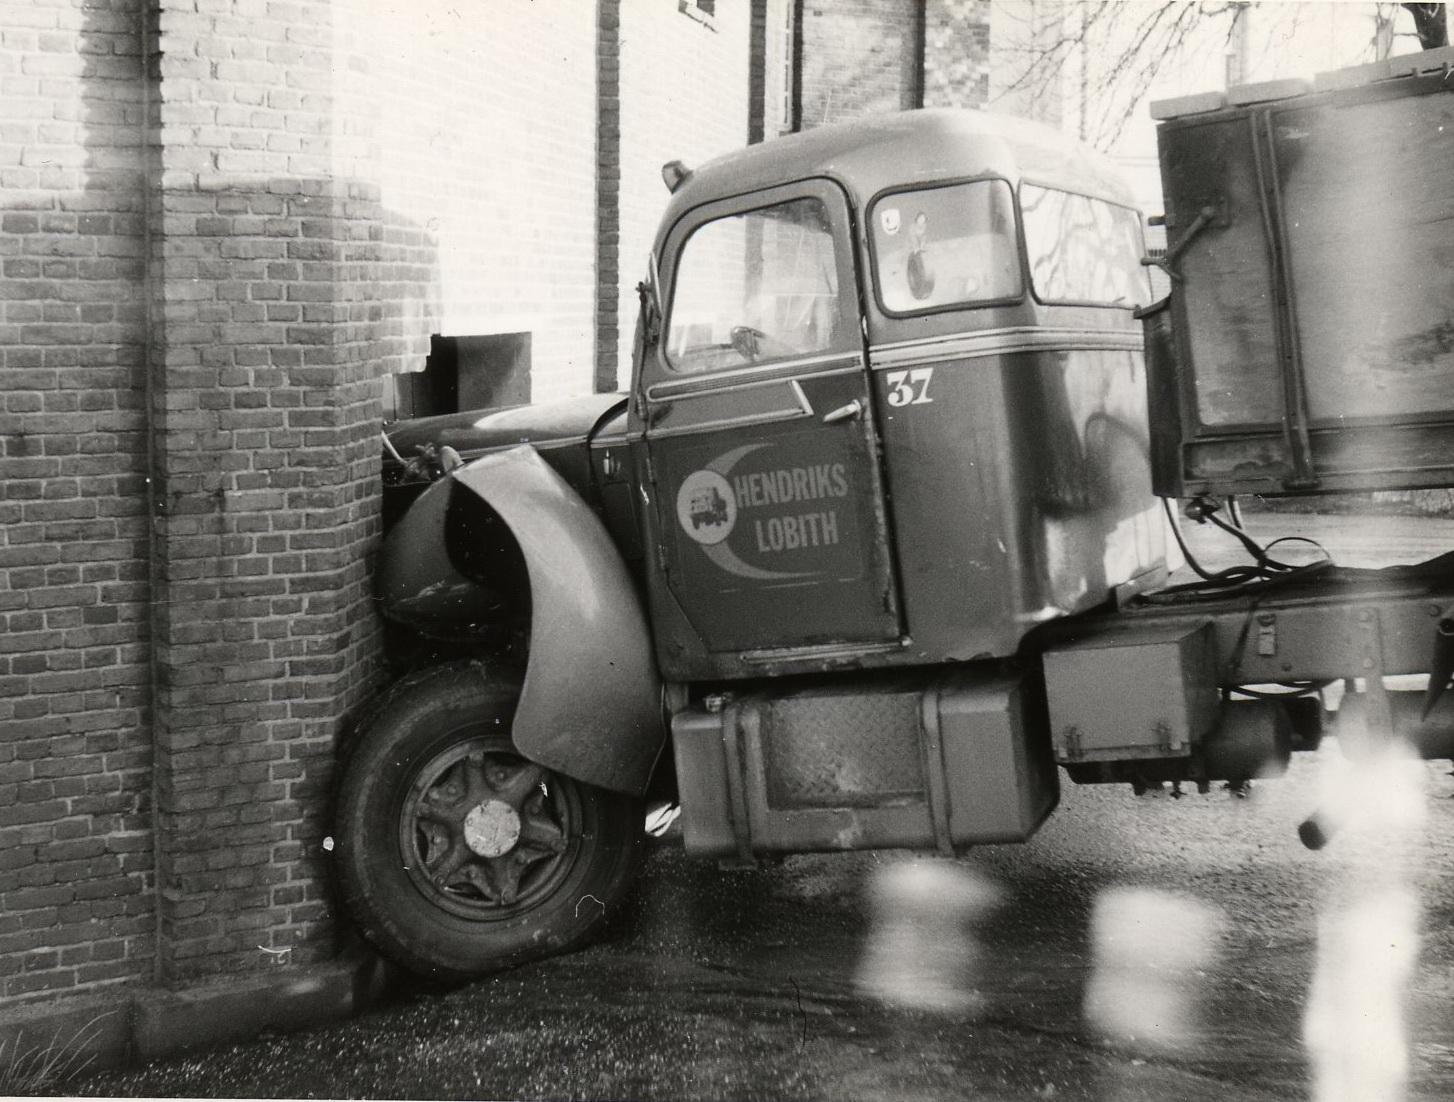 Hendriks-Lobith-Mack-B61S-VB7842-2